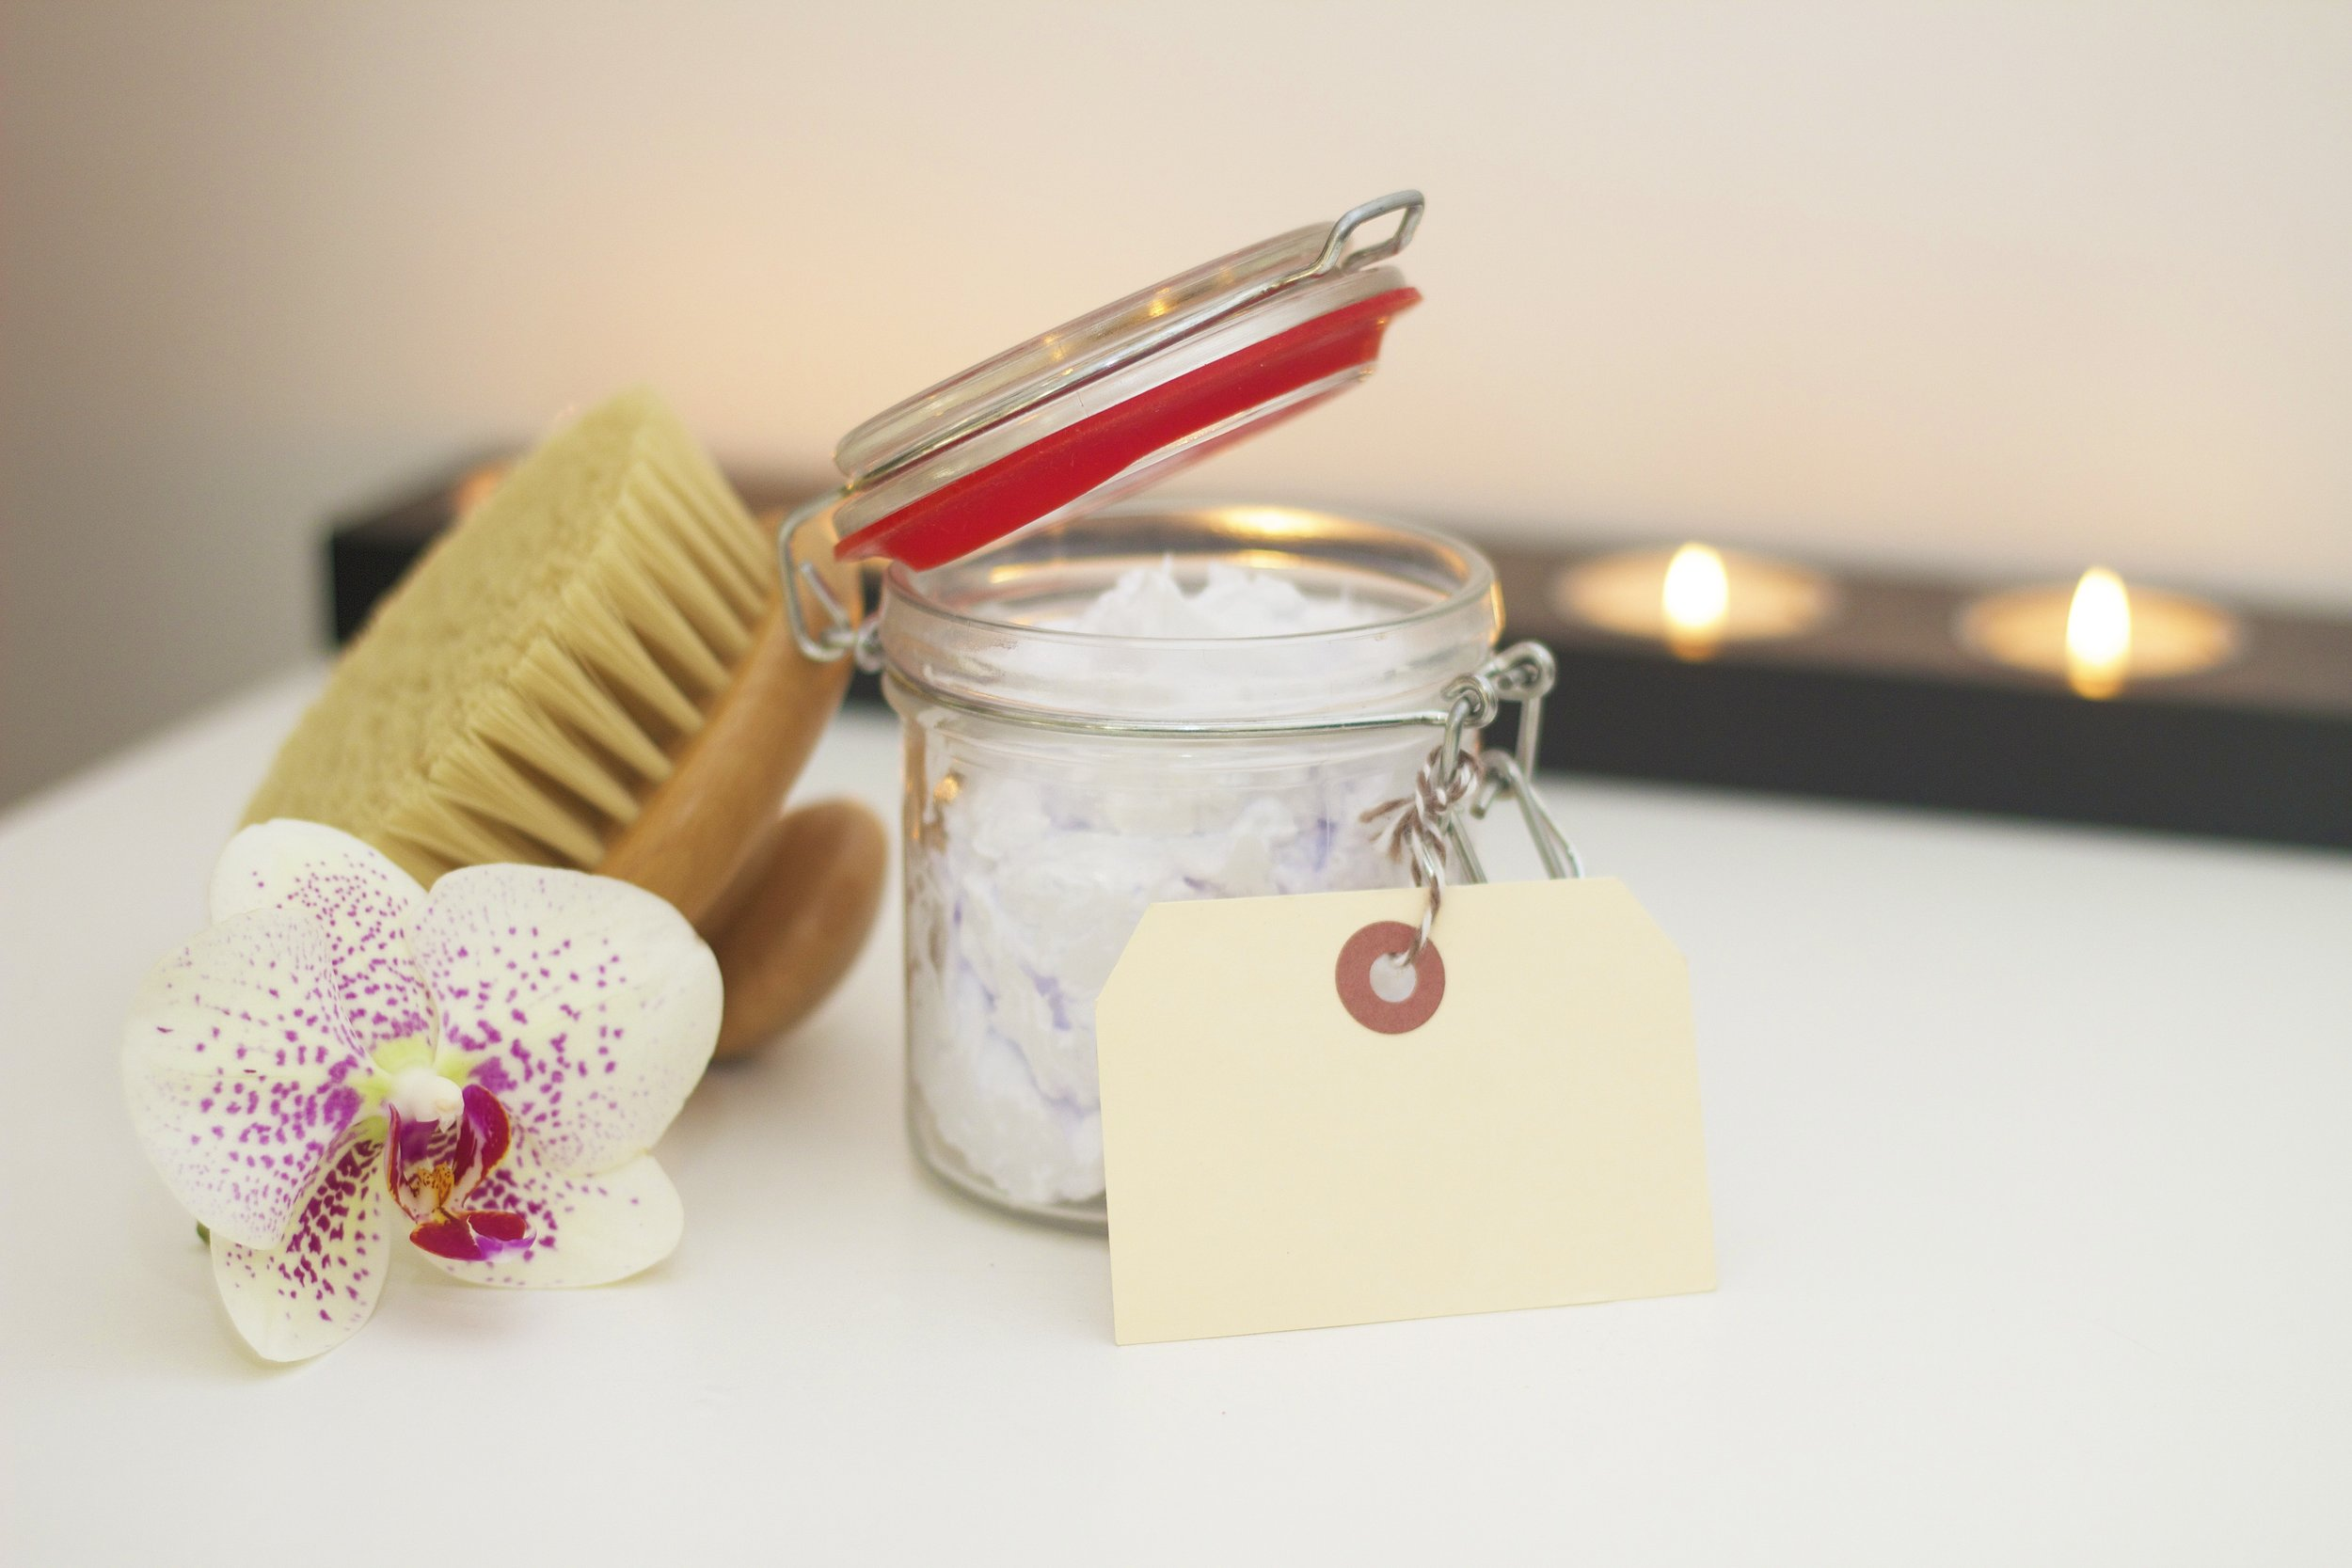 uwm.jacuzzi.sauna.improved.circulation.body.brush.bath-blur-brush-275765.jpg